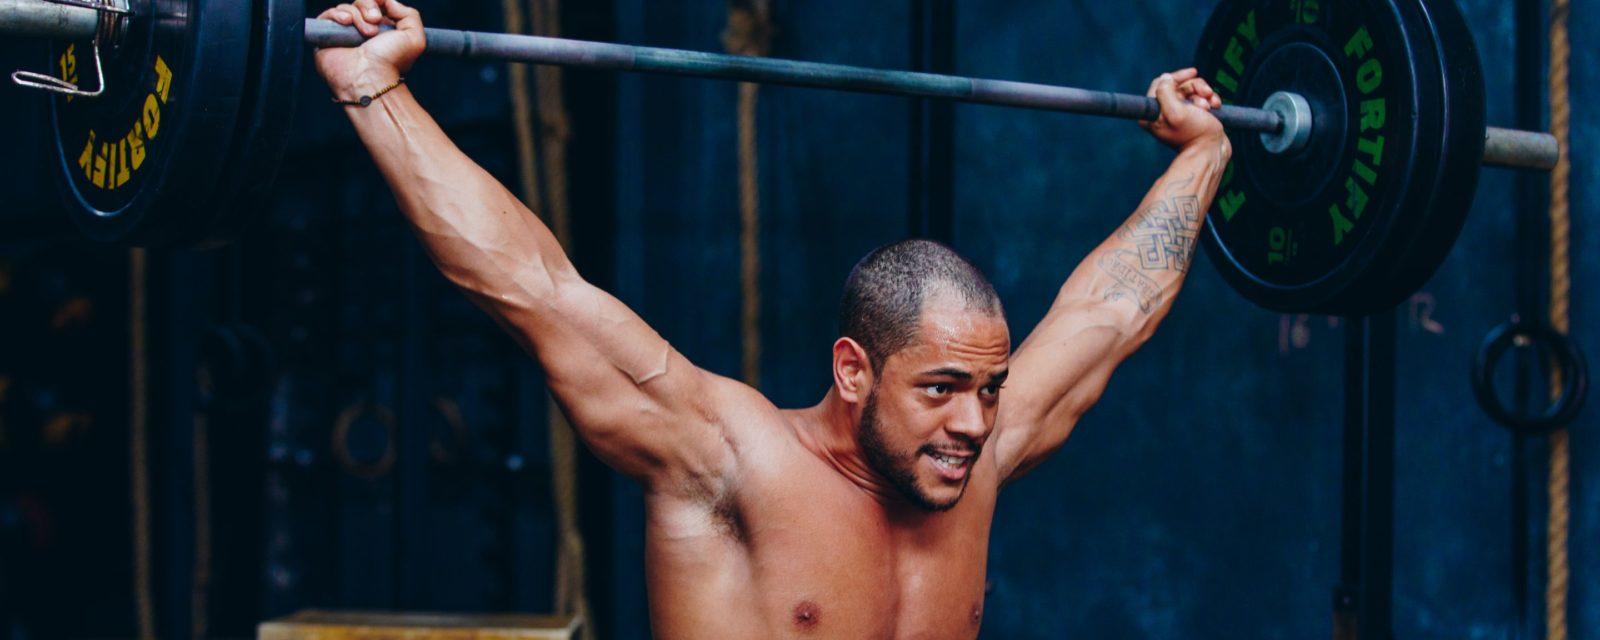 Comment gagner du muscles